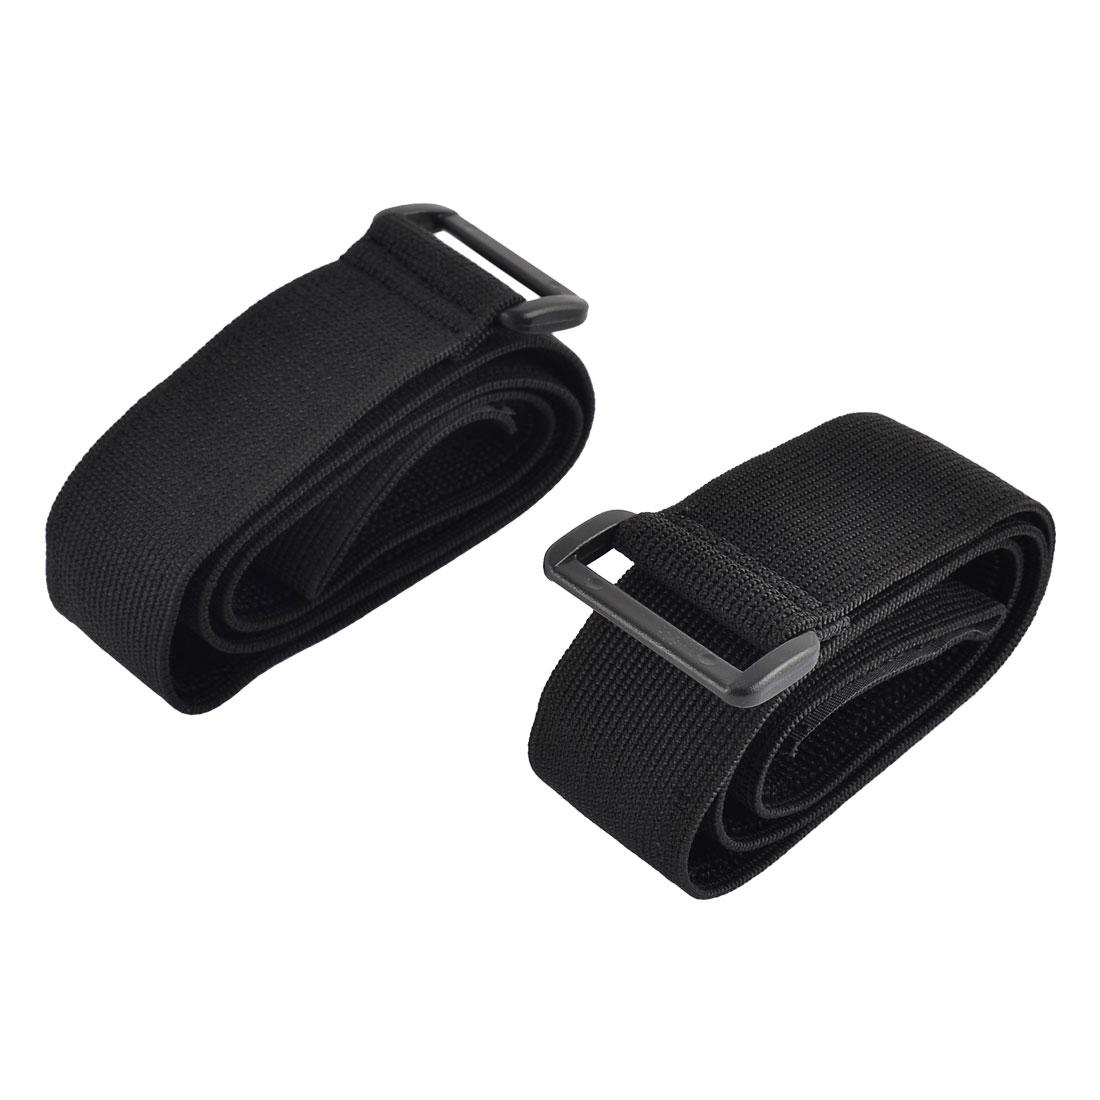 Luggage Nylon Elastic Cable Organizer Hook Loop Tie Strap Black 3.8 x 80cm 2pcs